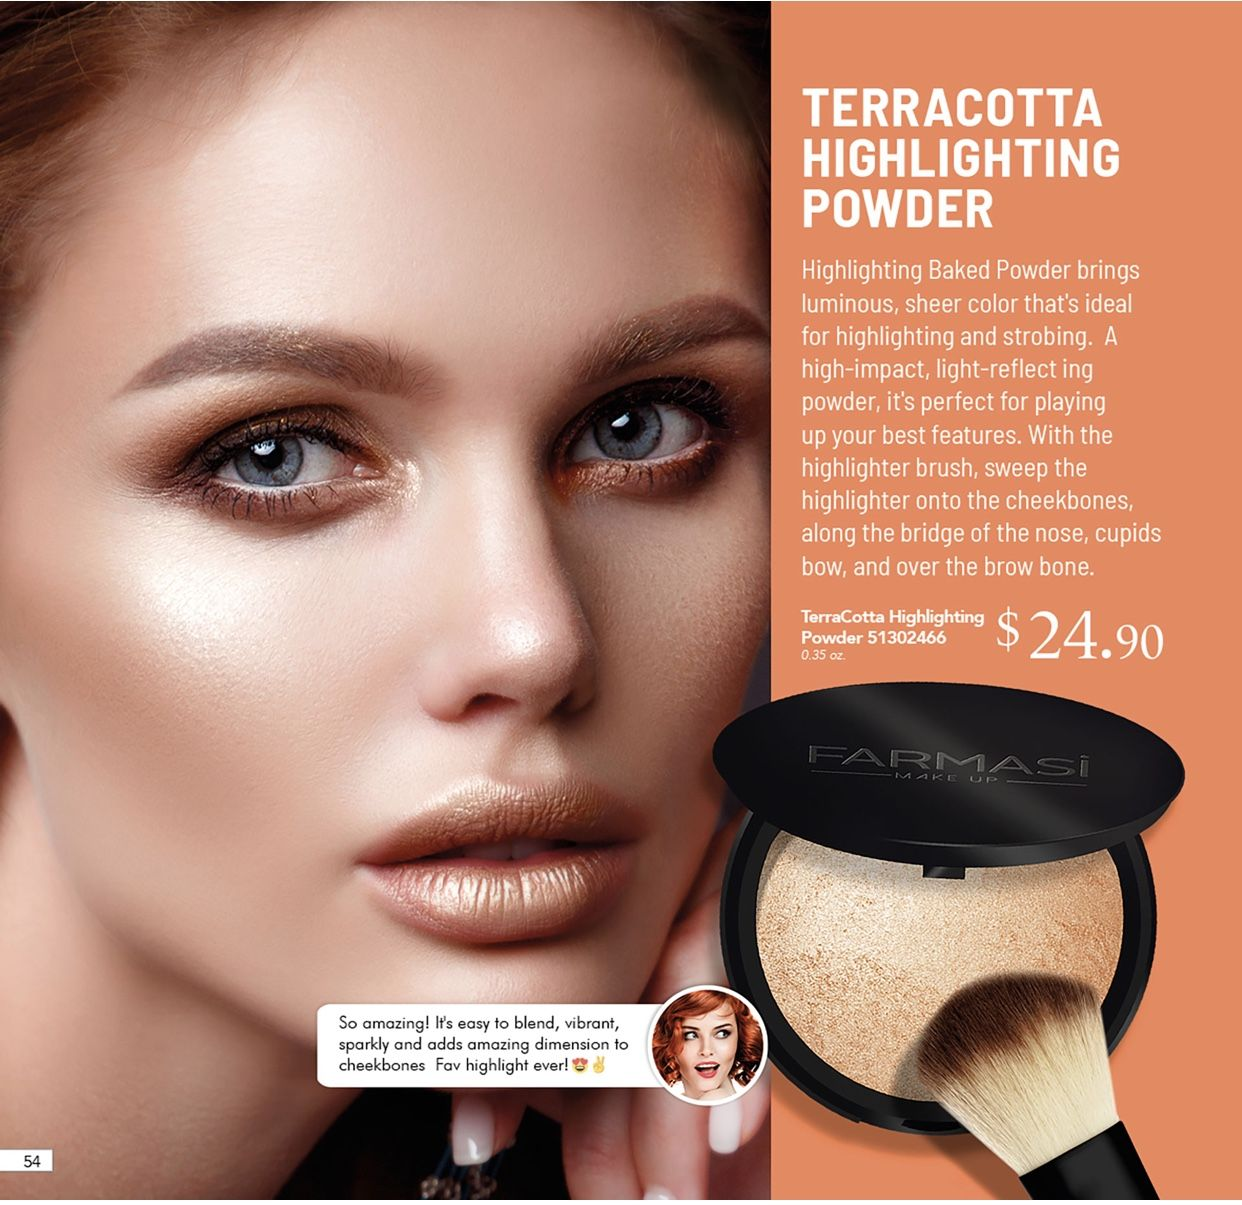 Terracotta baked powder Highlighter brush, Powder makeup